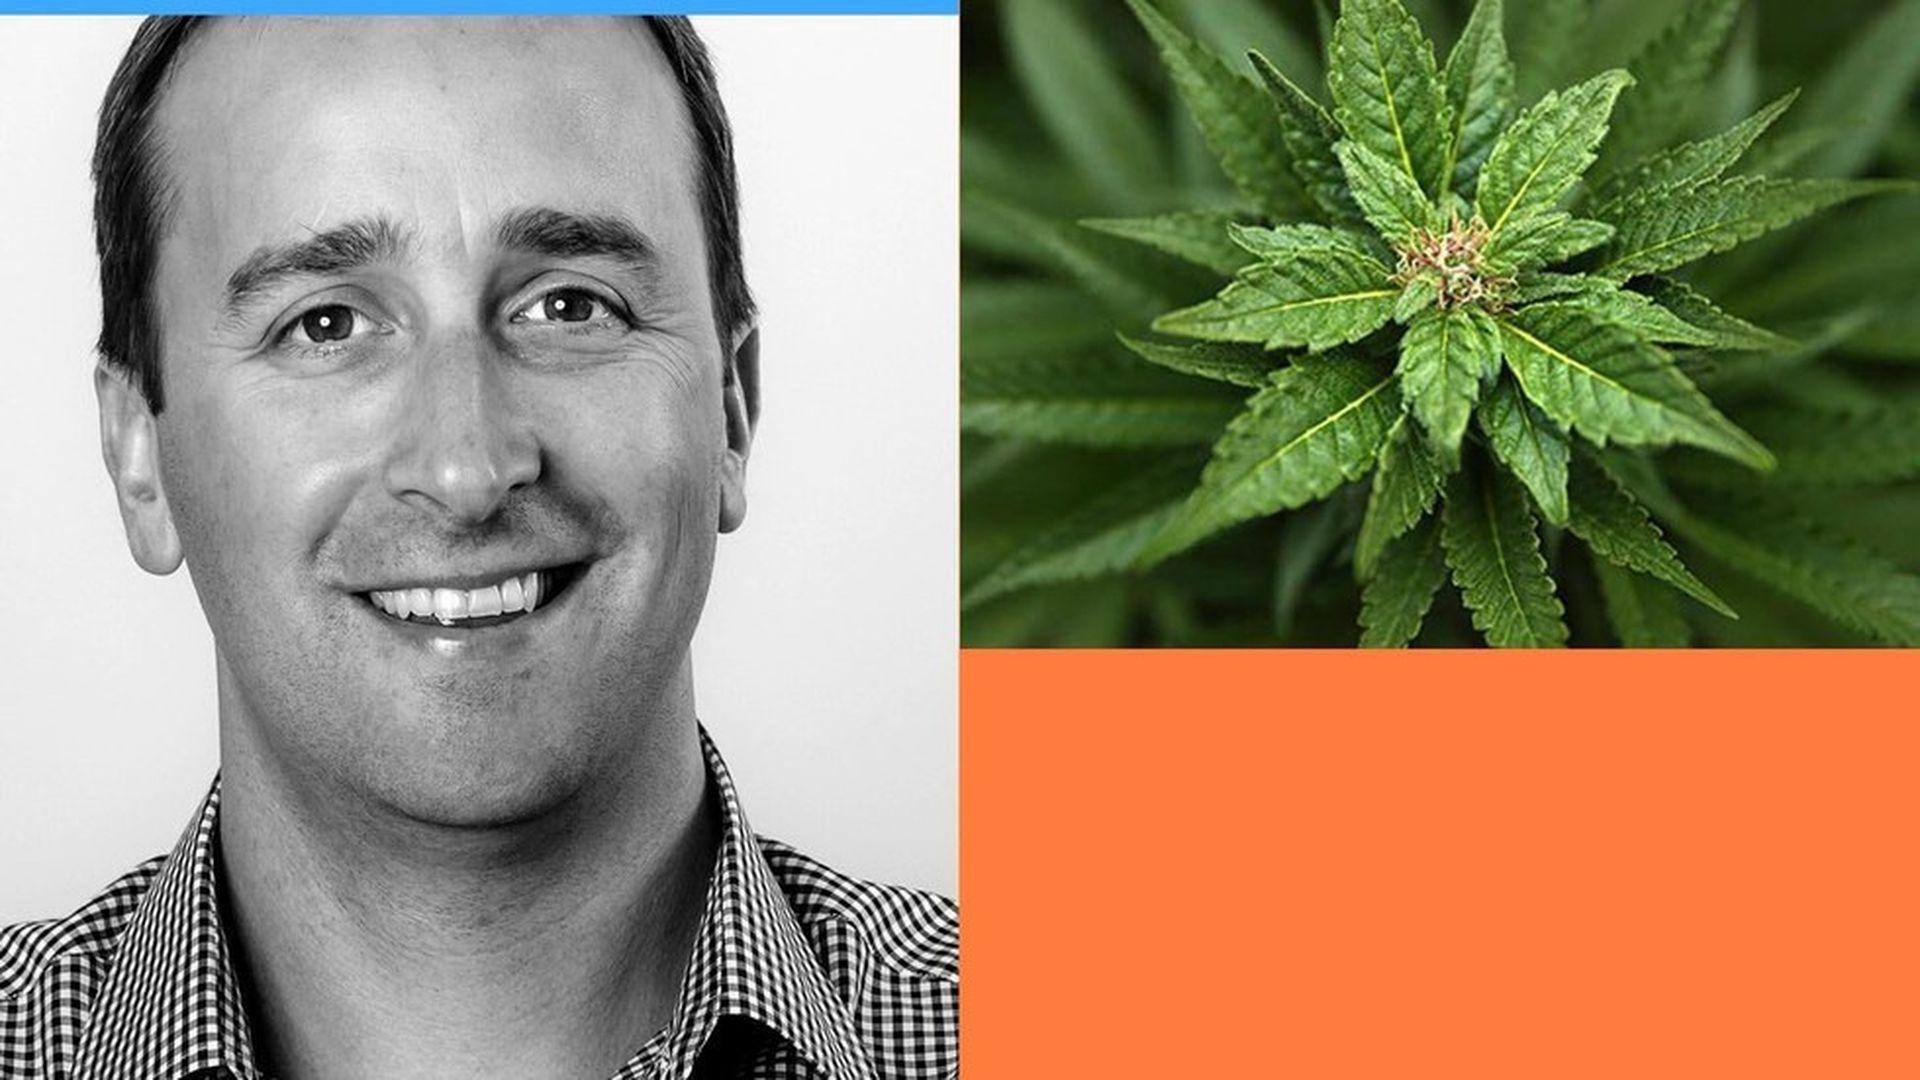 Eaze raises another $27M as money piles into cannabis tech